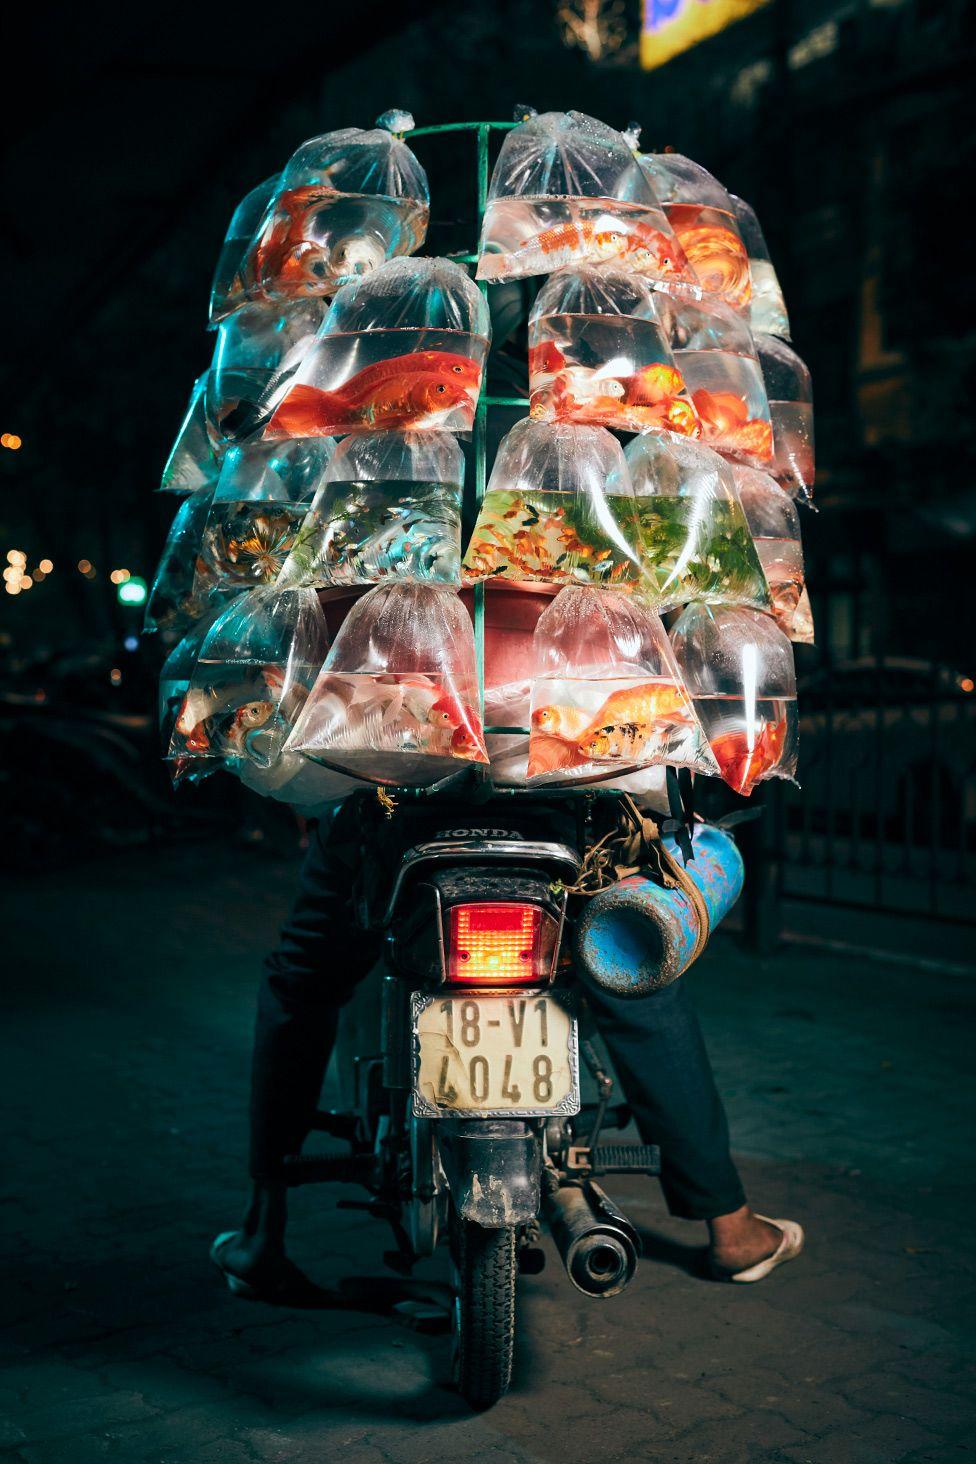 Вьетнамский мопед как образ жизни